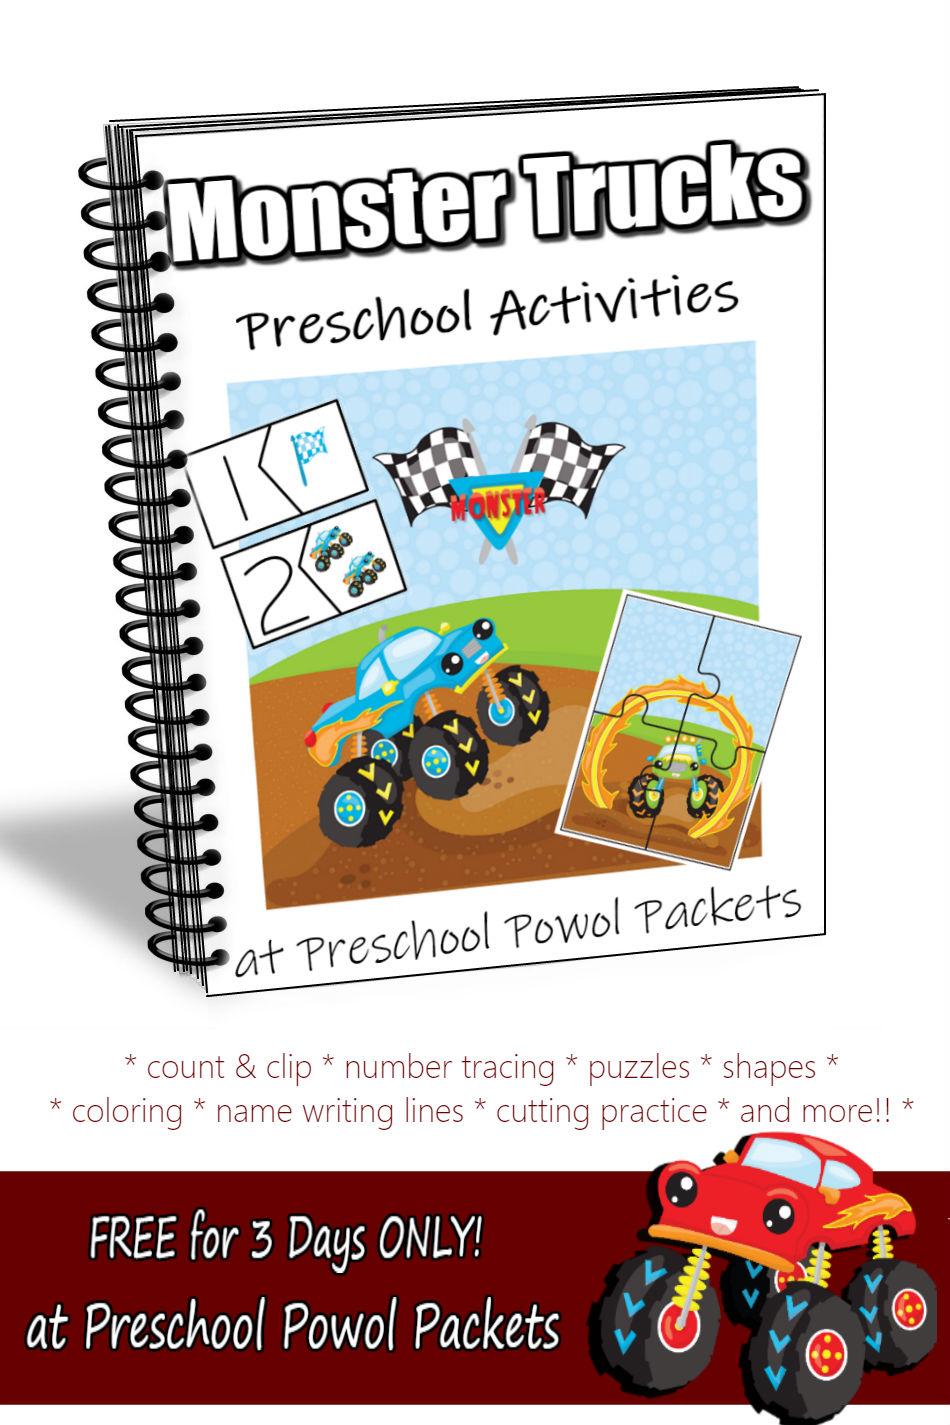 Monster Trucks Preschool Activities Packet Free For 3 Days Only Preschool Powol Packets